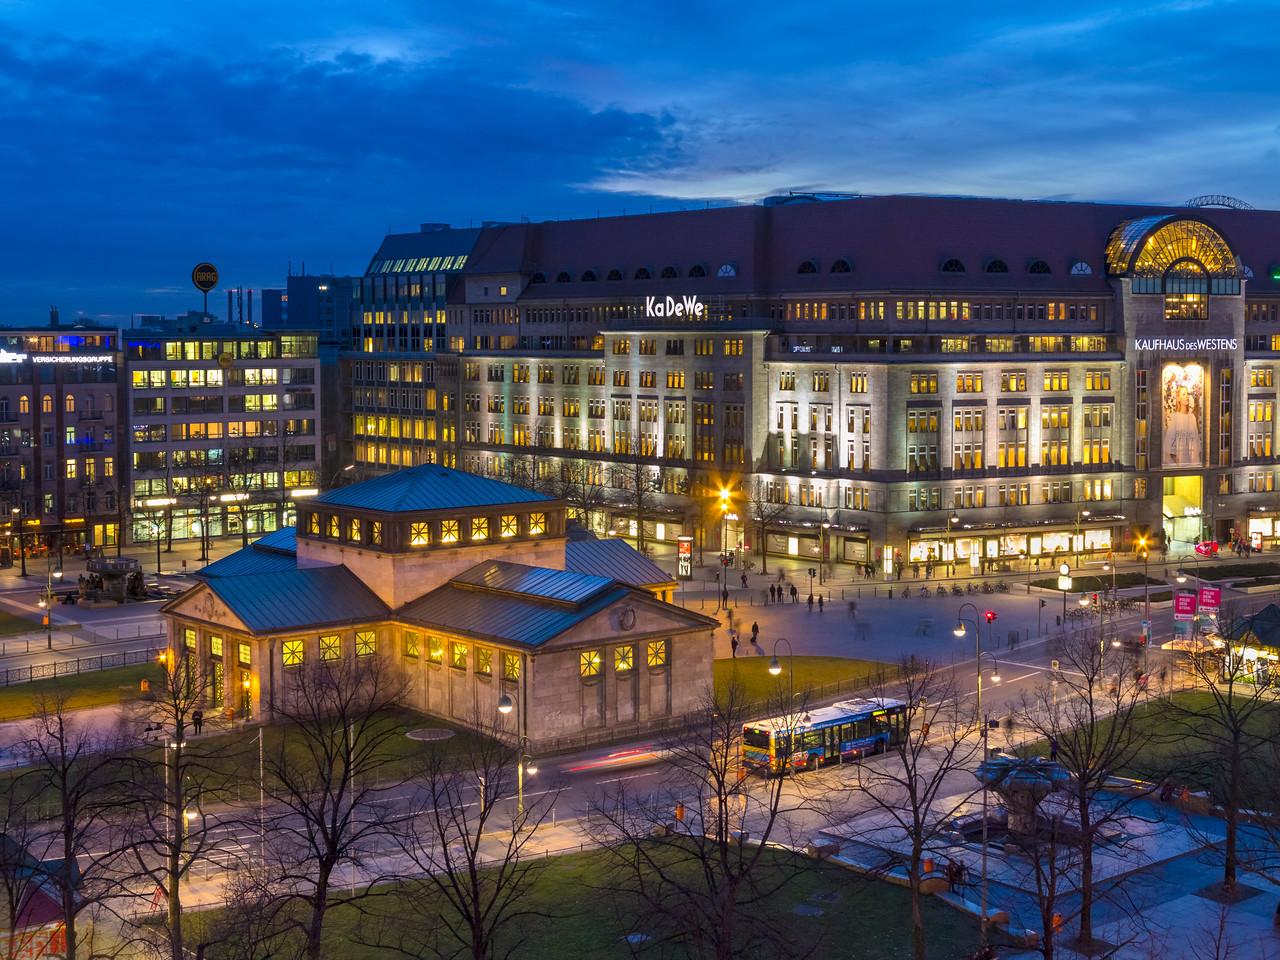 Berlin's Wittenbergplatz and the famous department store Ka De We in the background